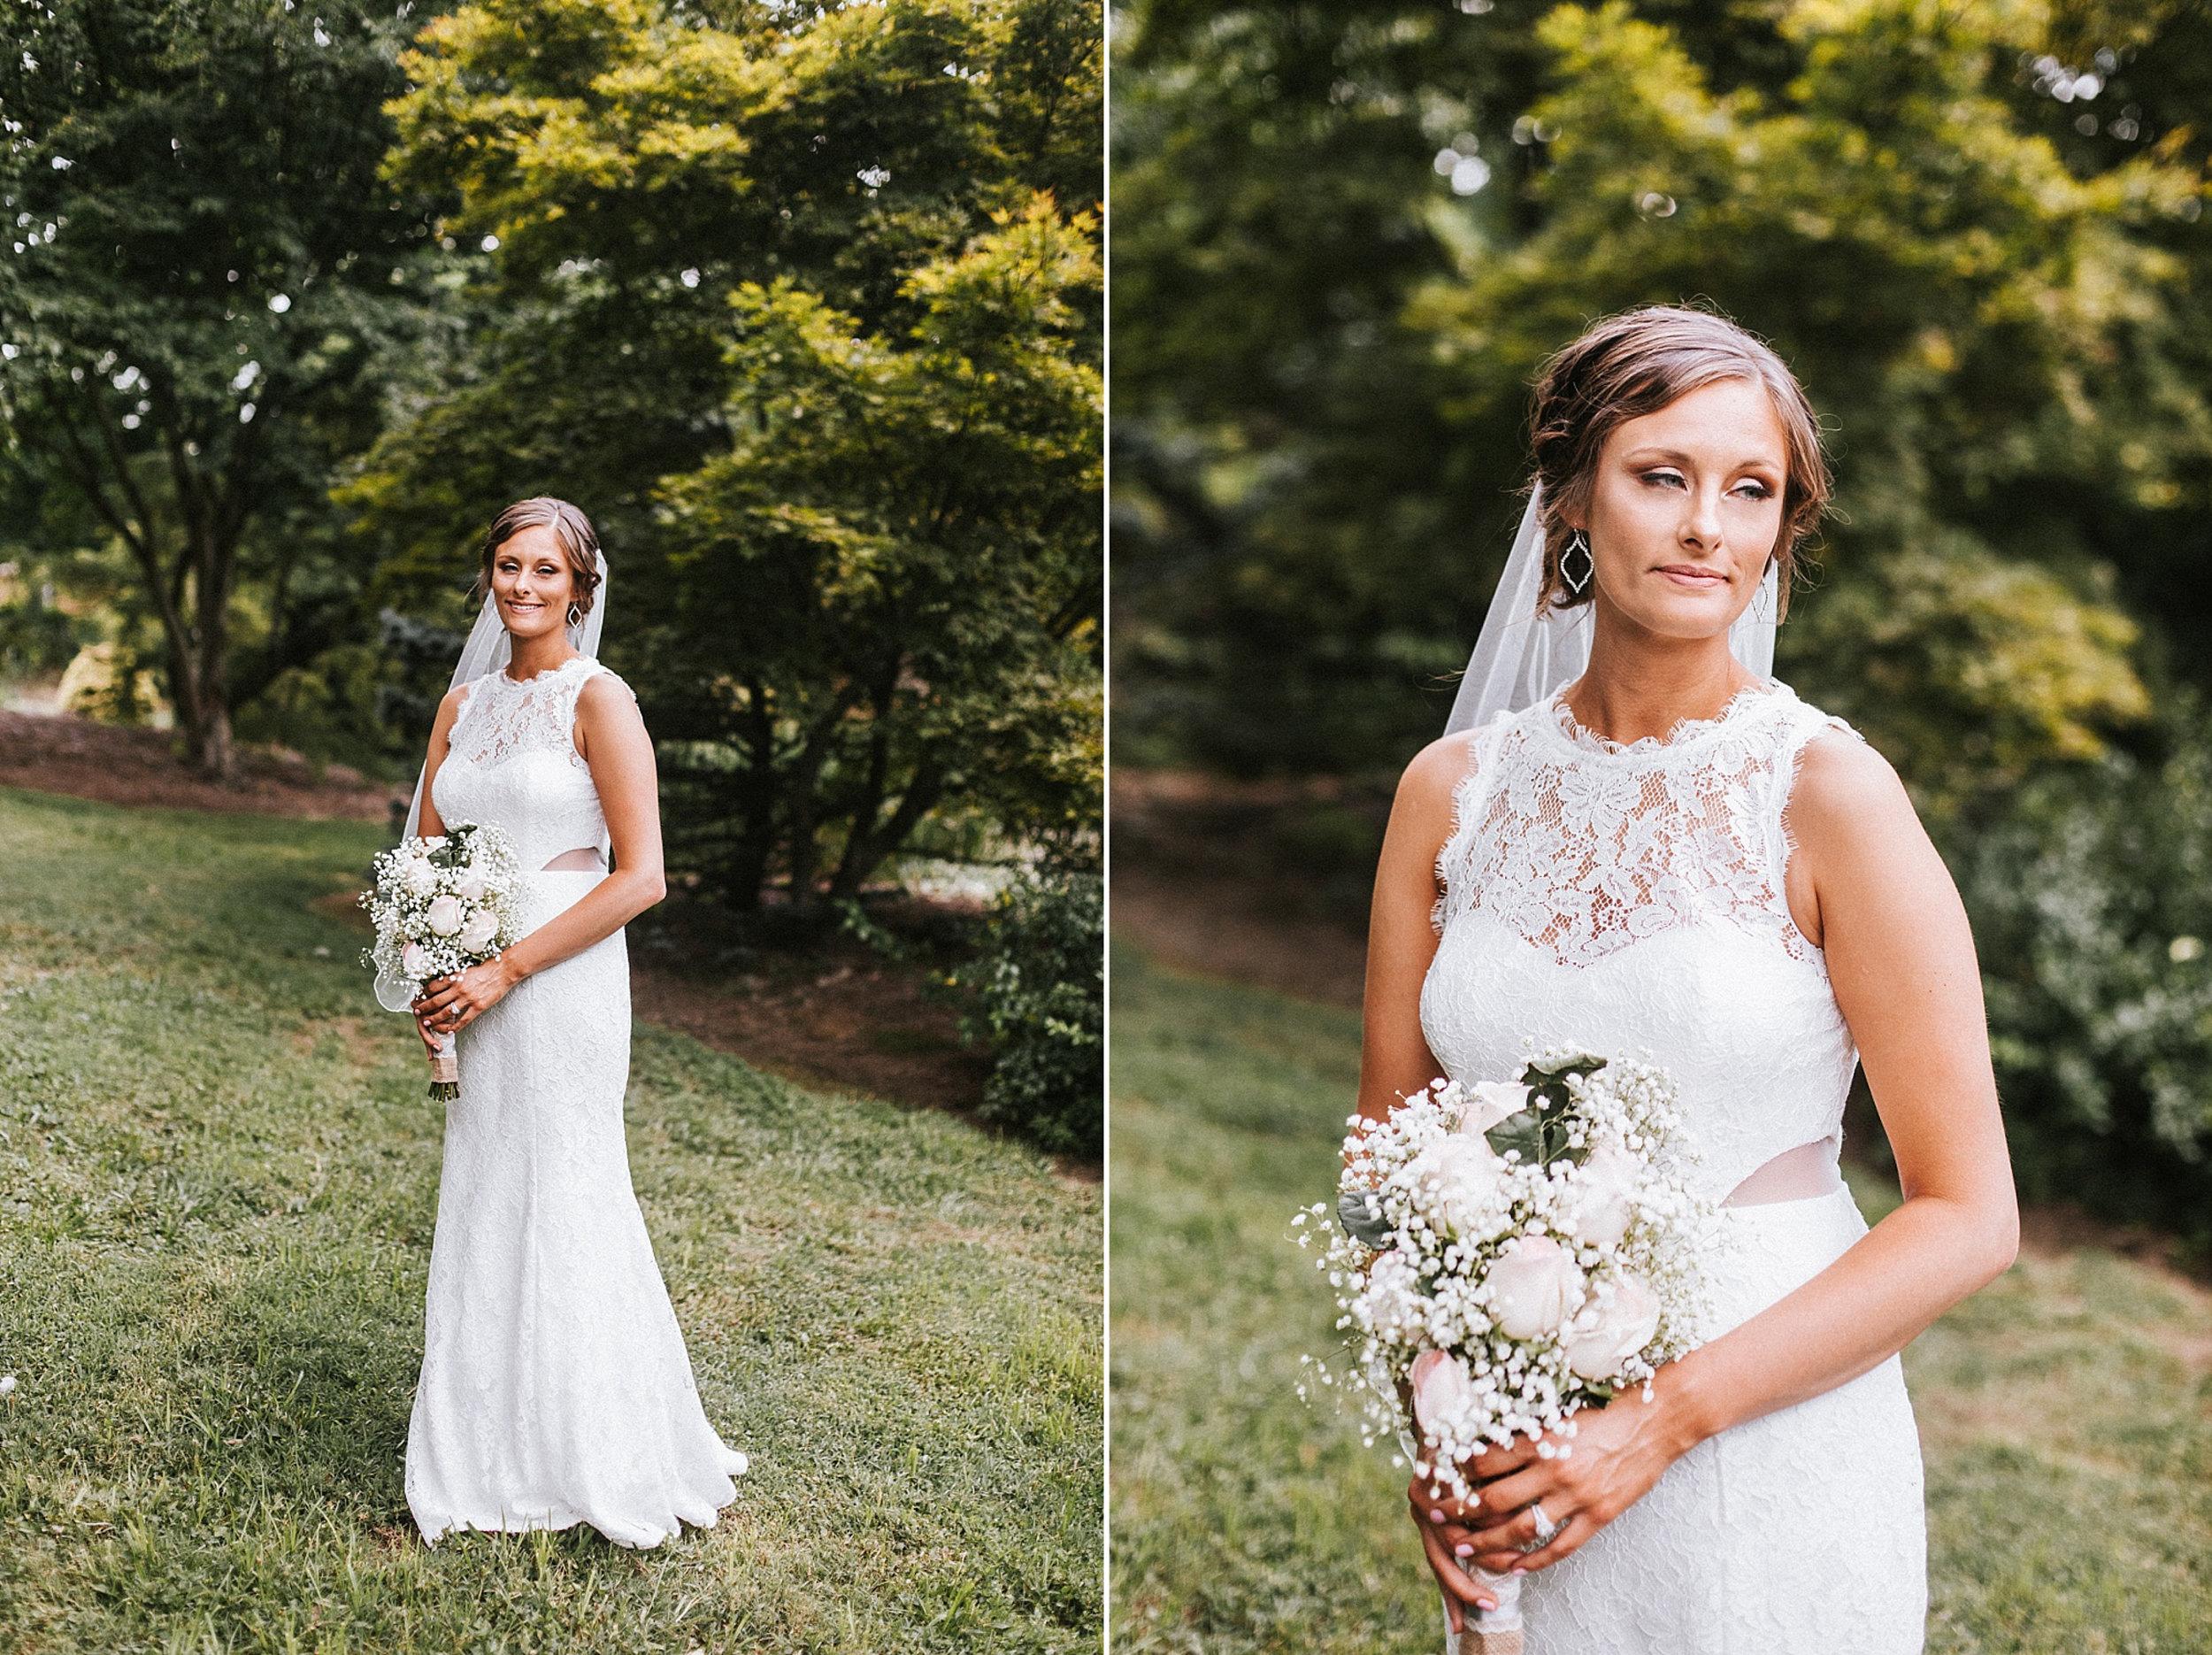 Brooke Townsend Photography - Ohio Wedding Photographer (29 of 78).jpg